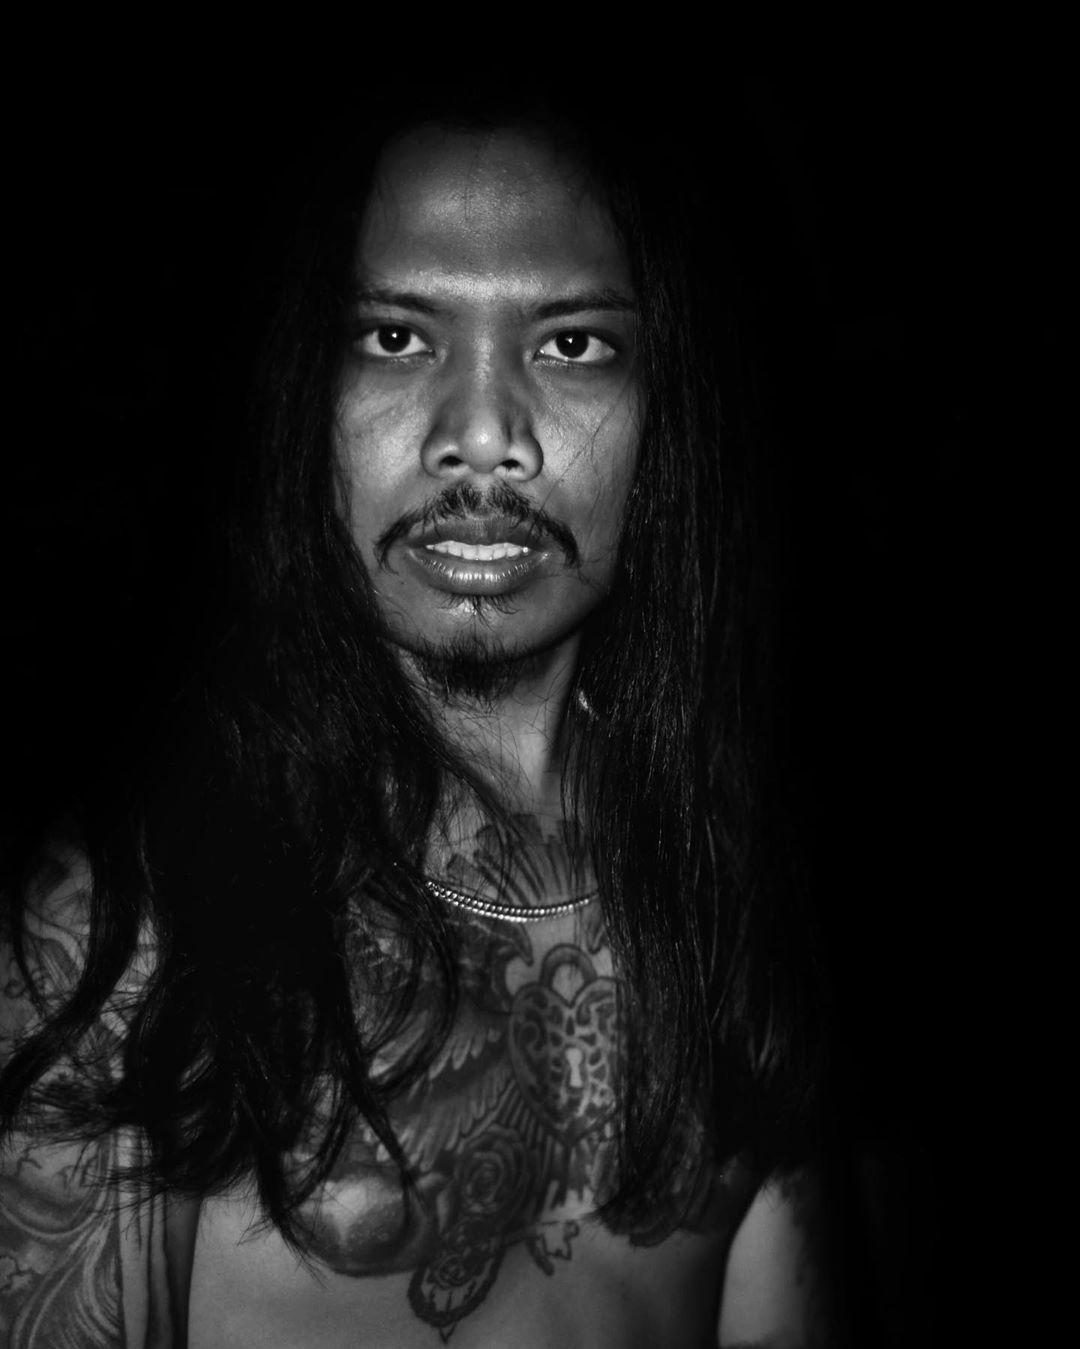 Black and white  By.@madejulius  #canon #photography #photoediting #dark #balckandwhite #blackhair #lifestyle #tattoos #tattoolifestyle #follow4like #bali #baliindonesia